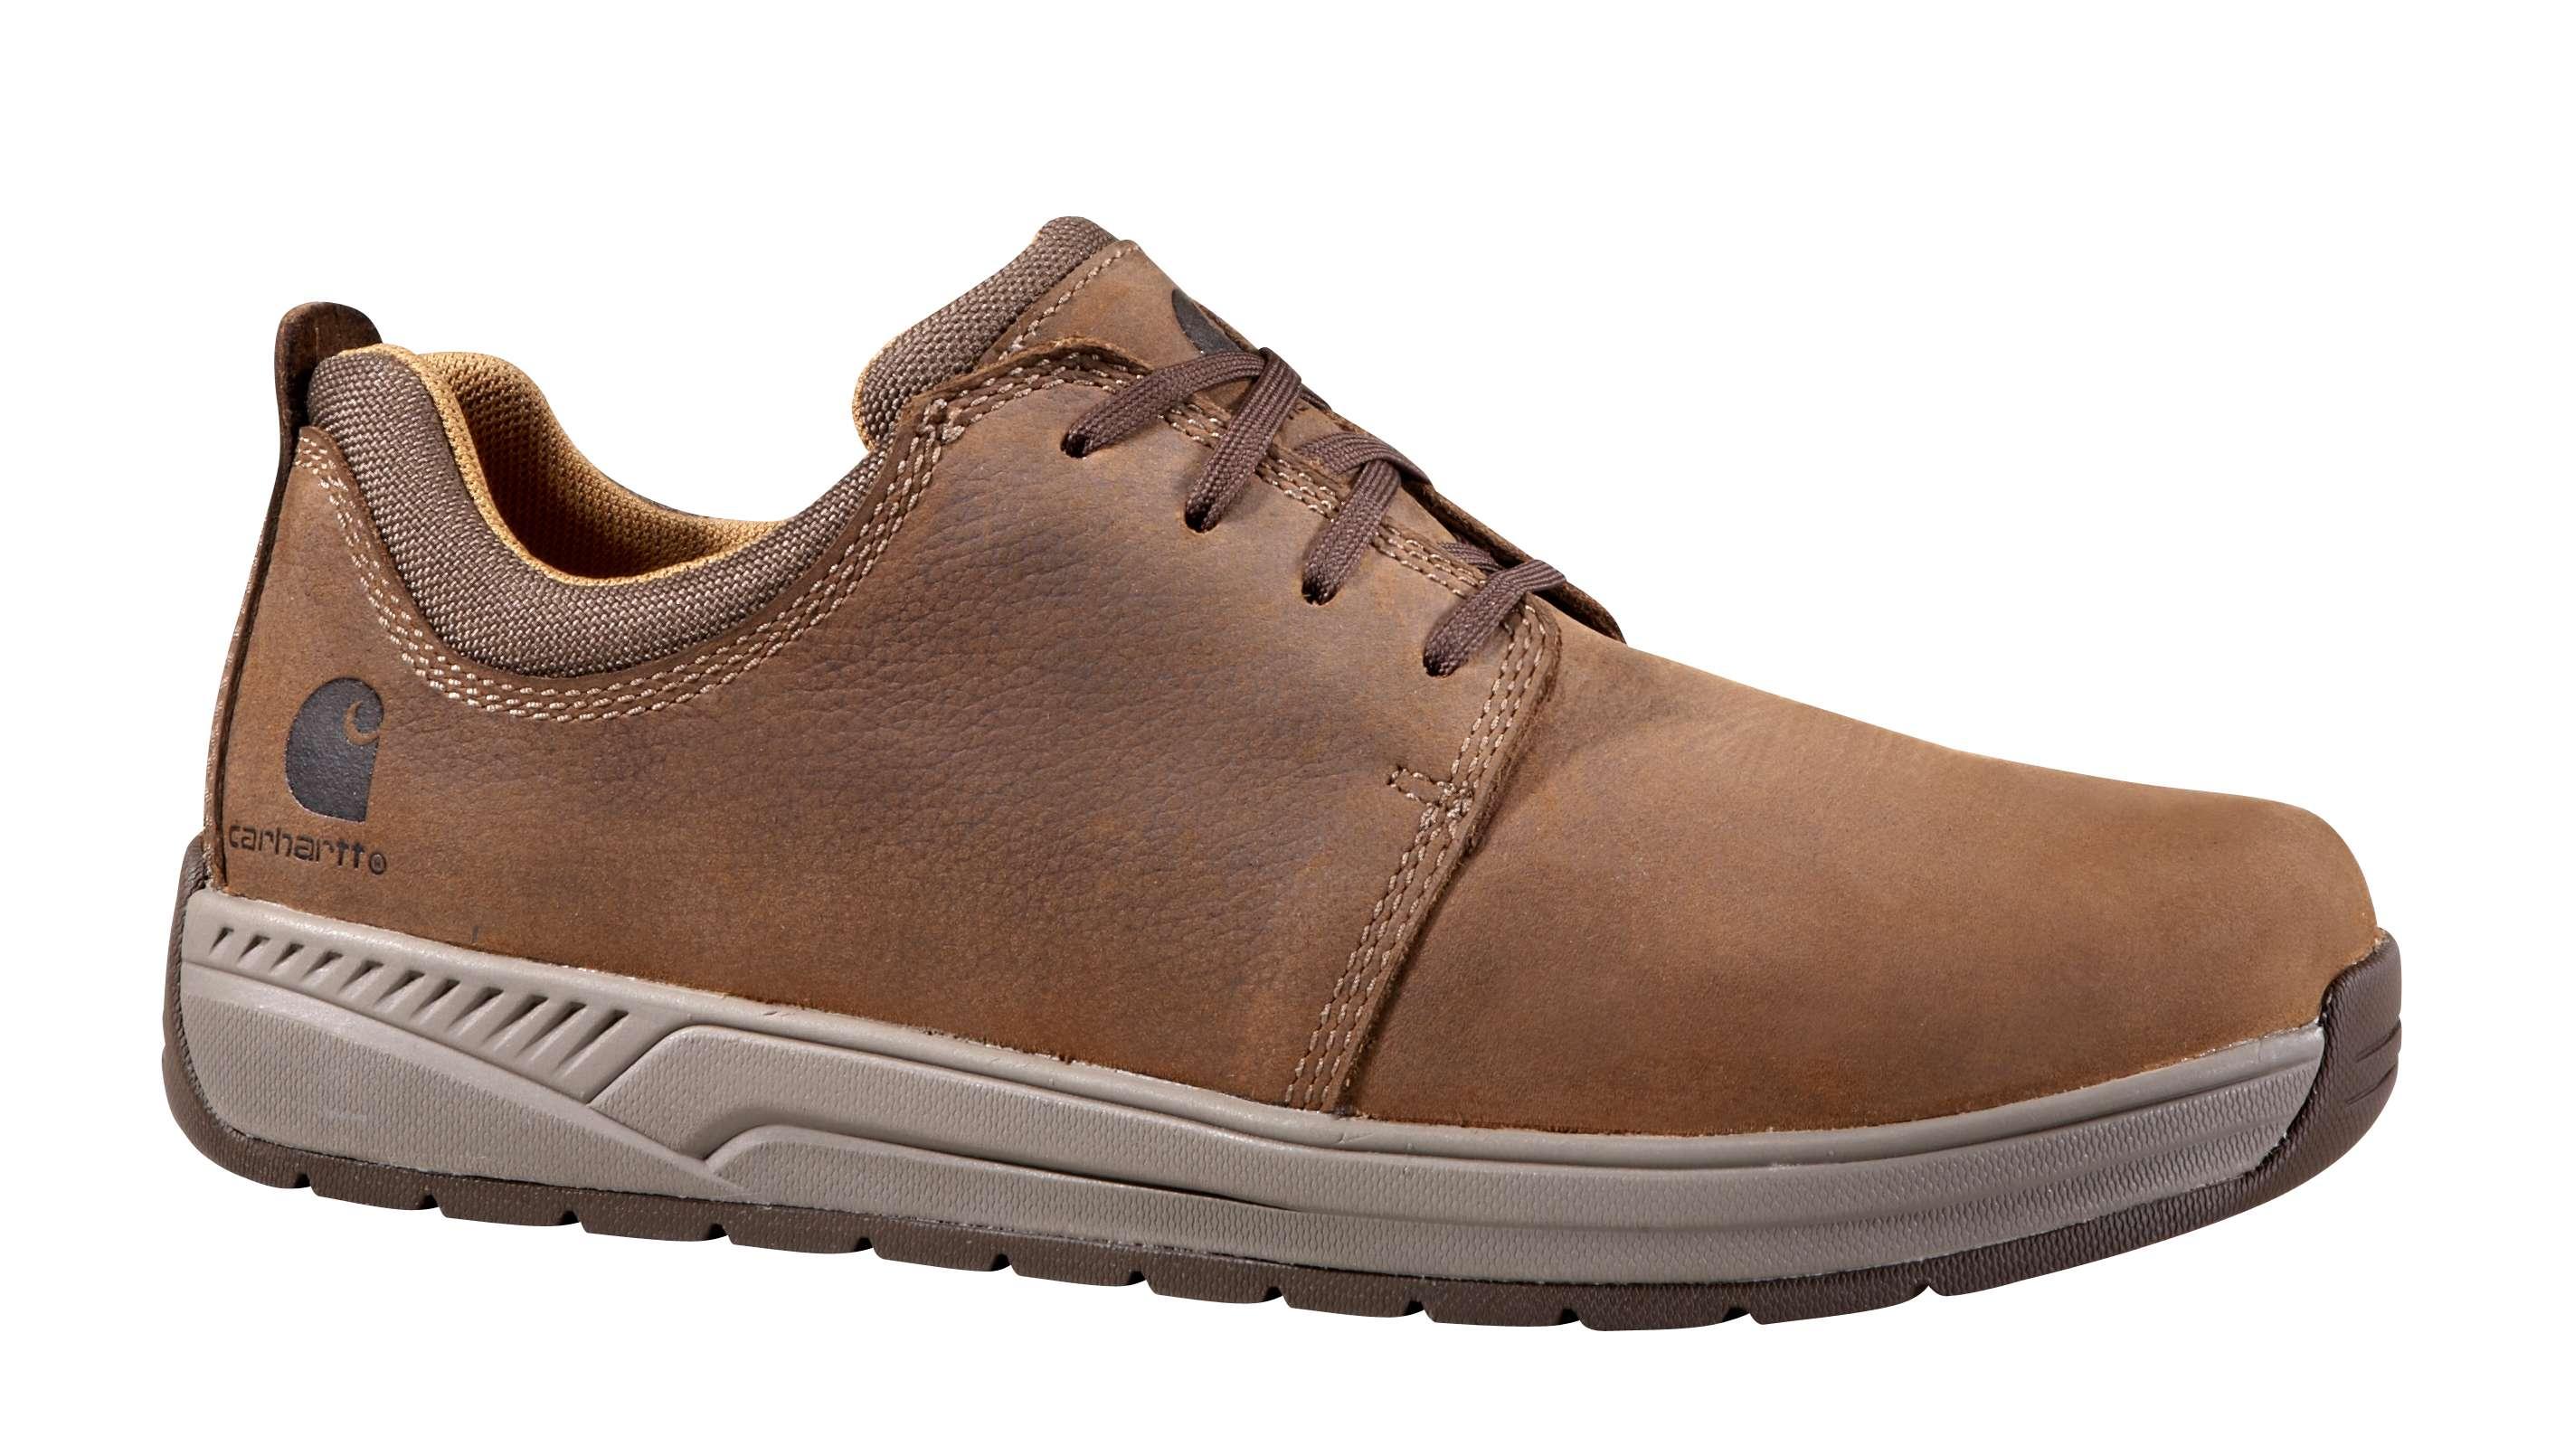 Carhartt Non-safety Toe Oxford Shoe